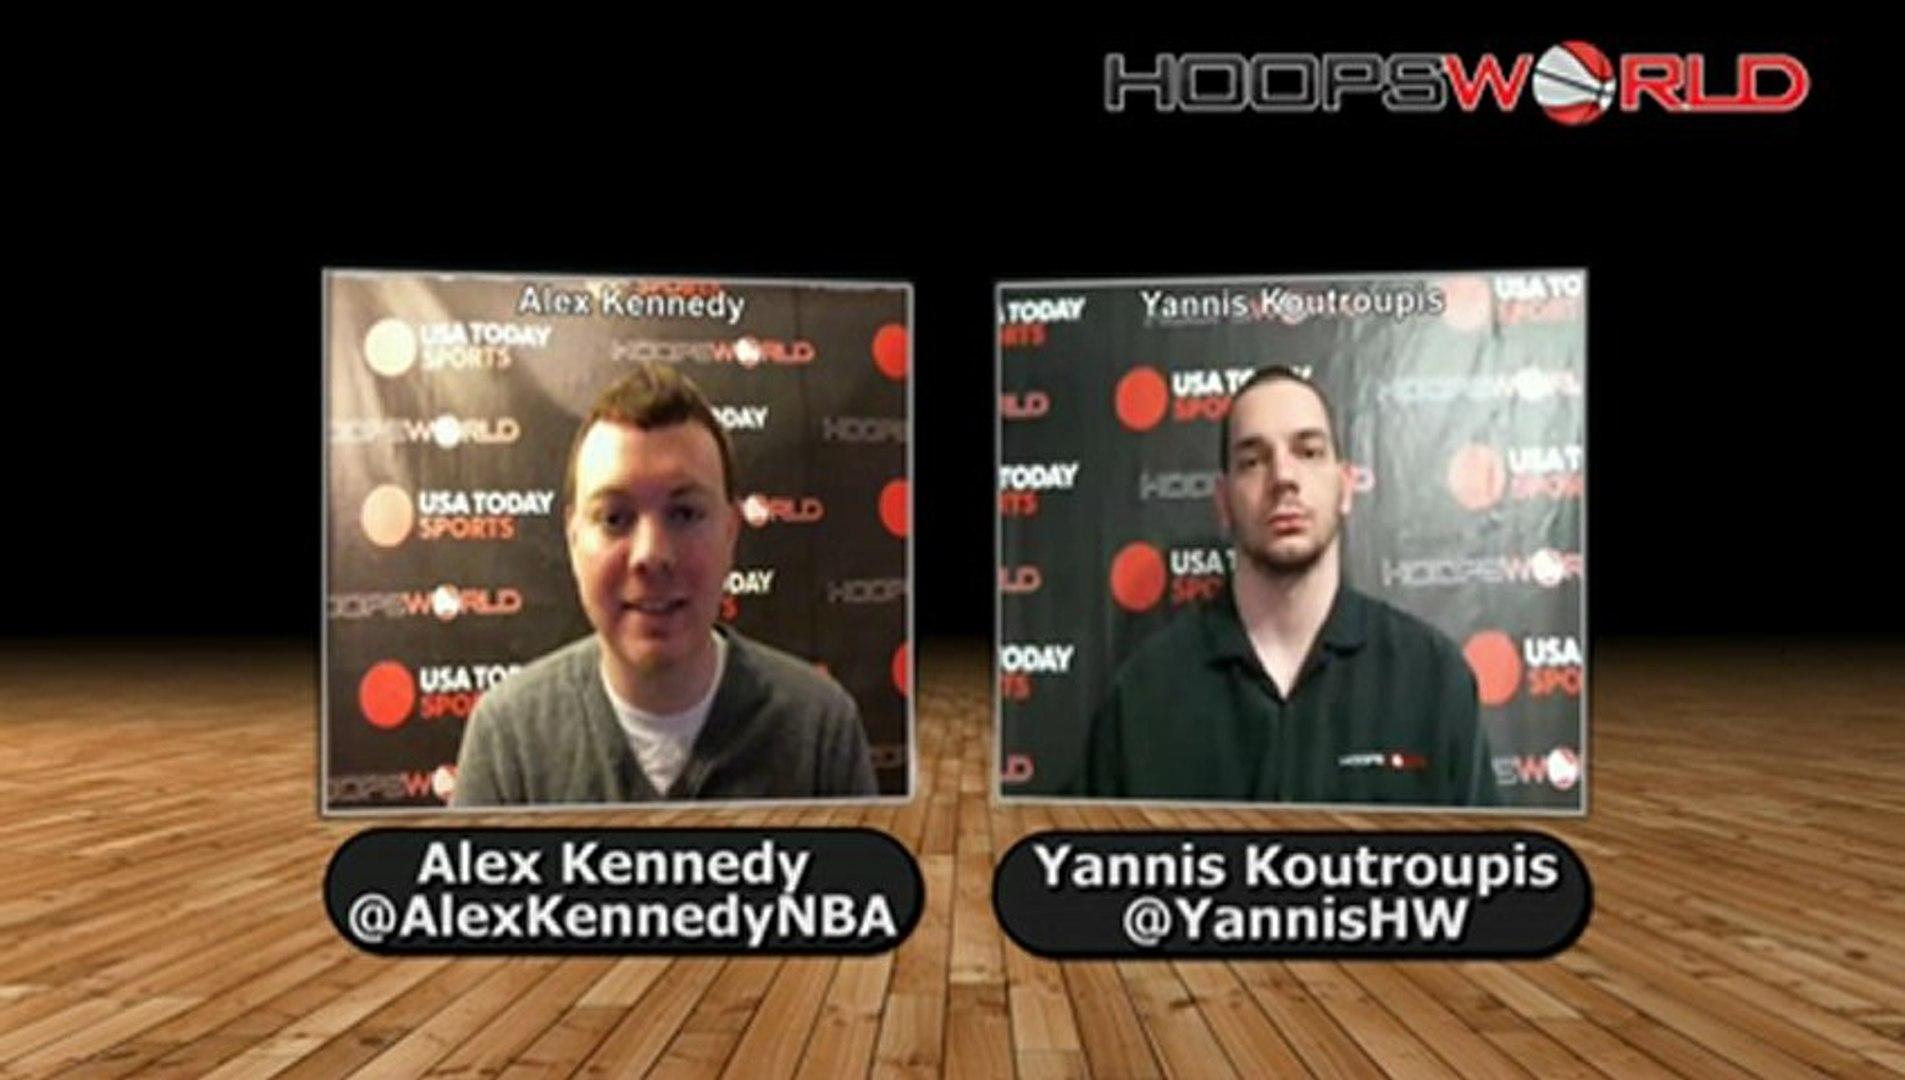 HOOPSWORLD TV: Rockets For Real?